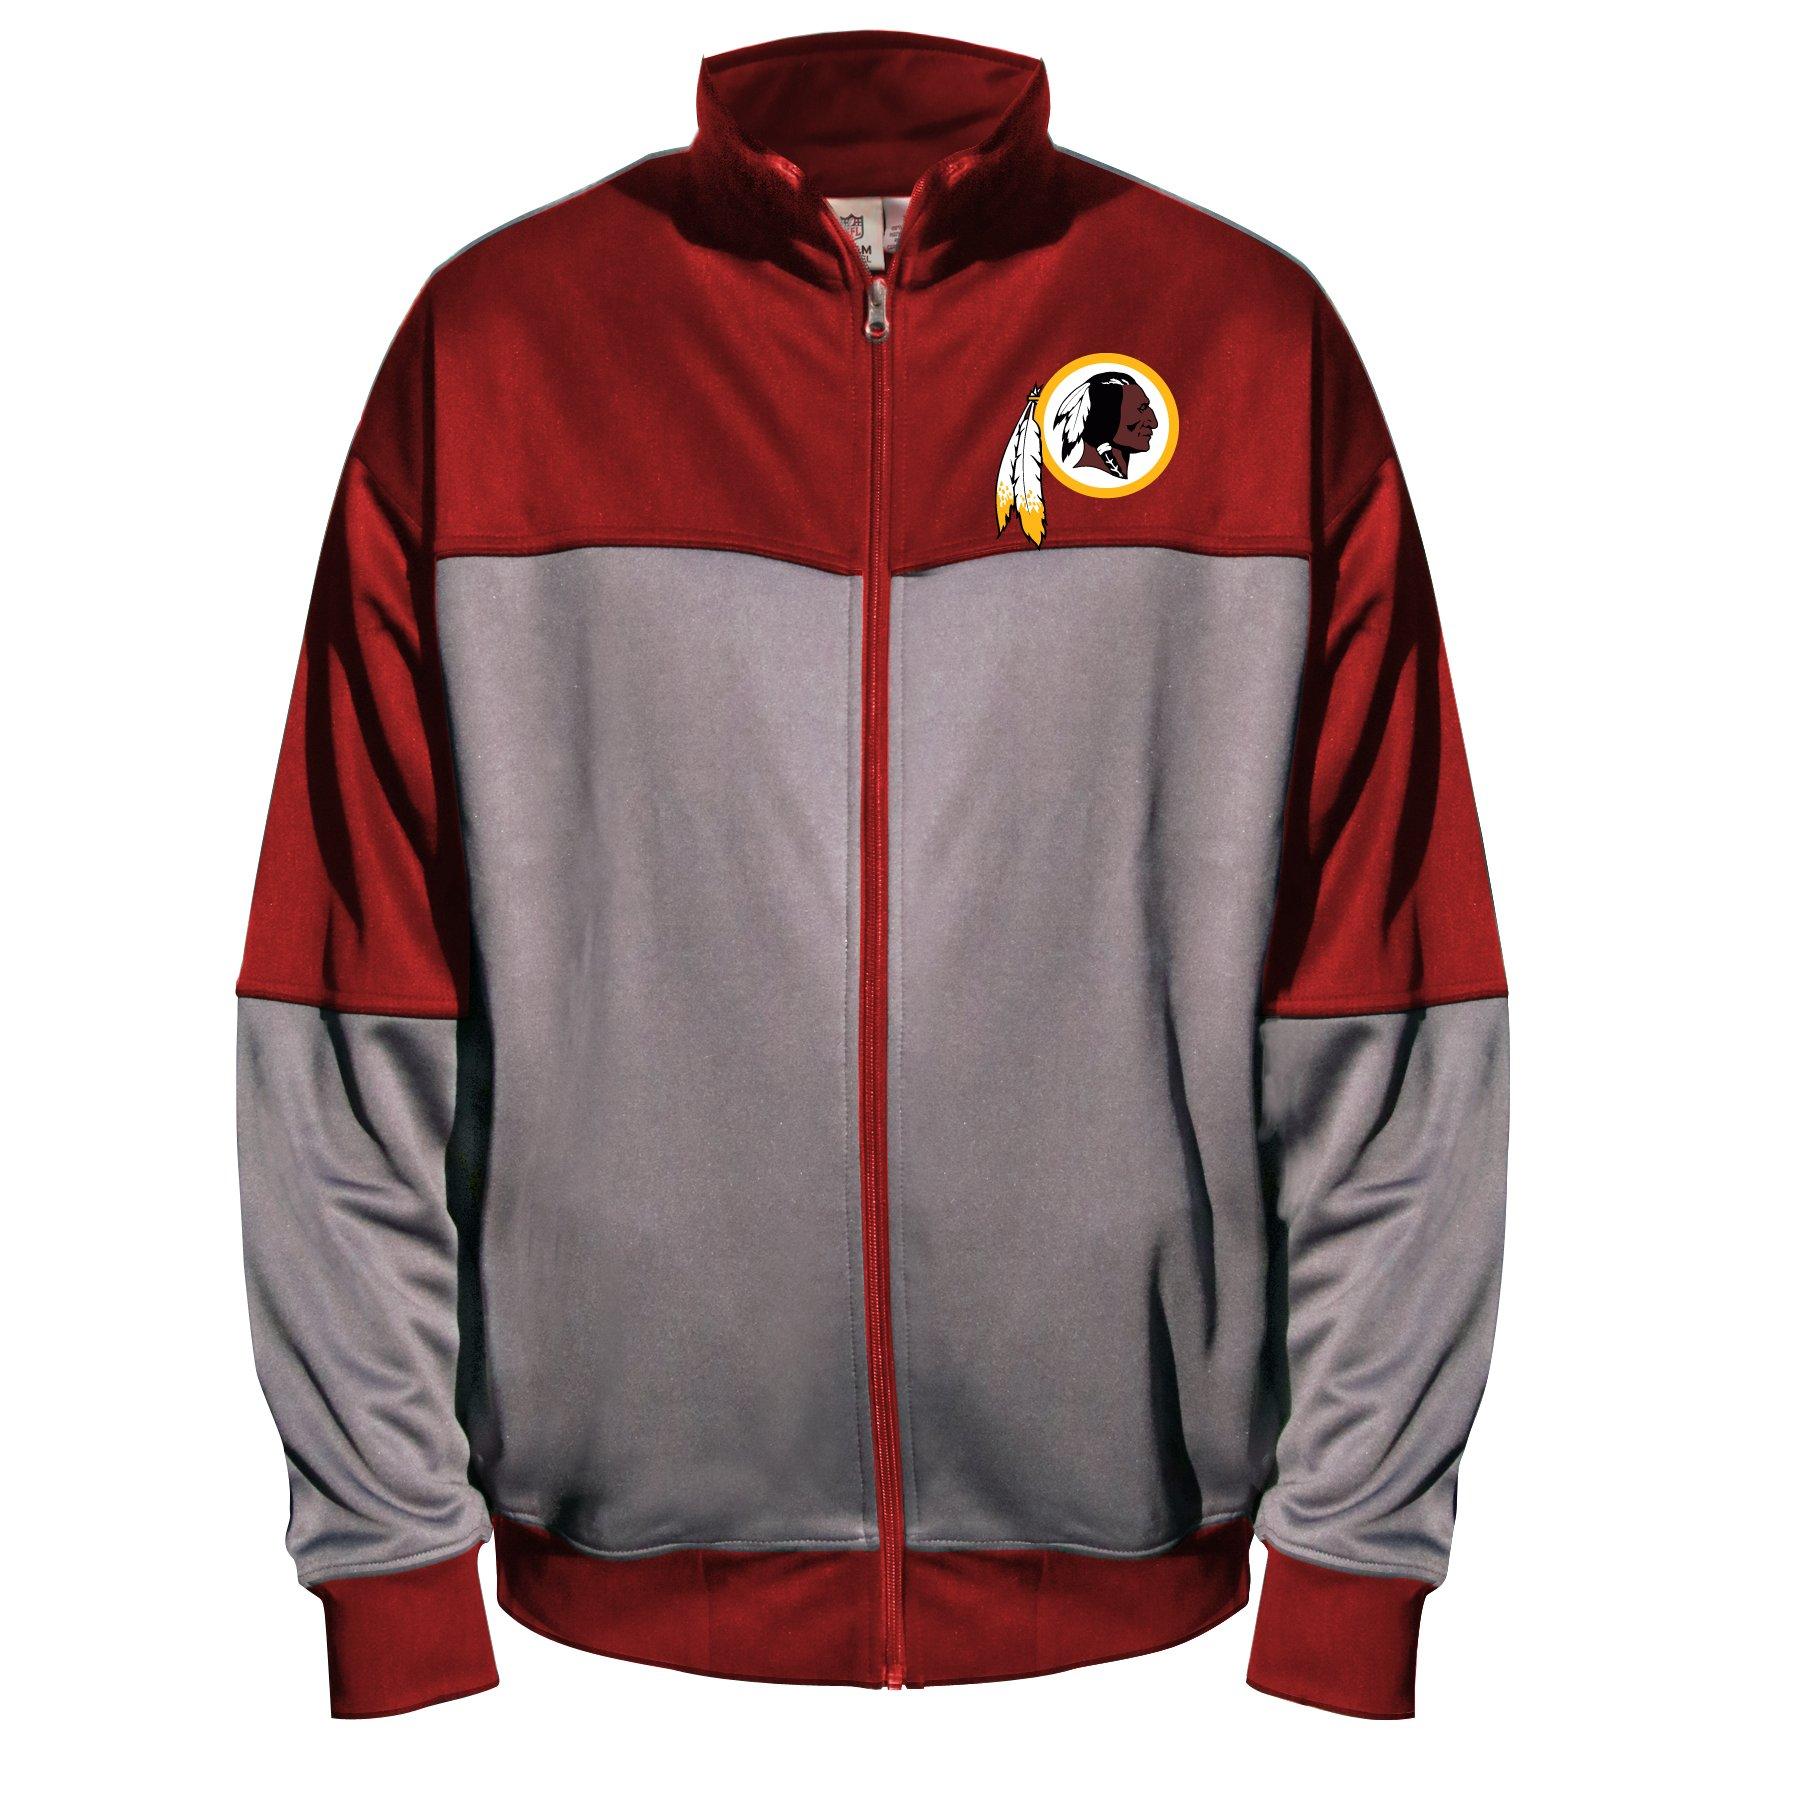 NFL Washington Redskins Unisex Poly Fleece Track Jacket, Charcoal/Garnet, 4X